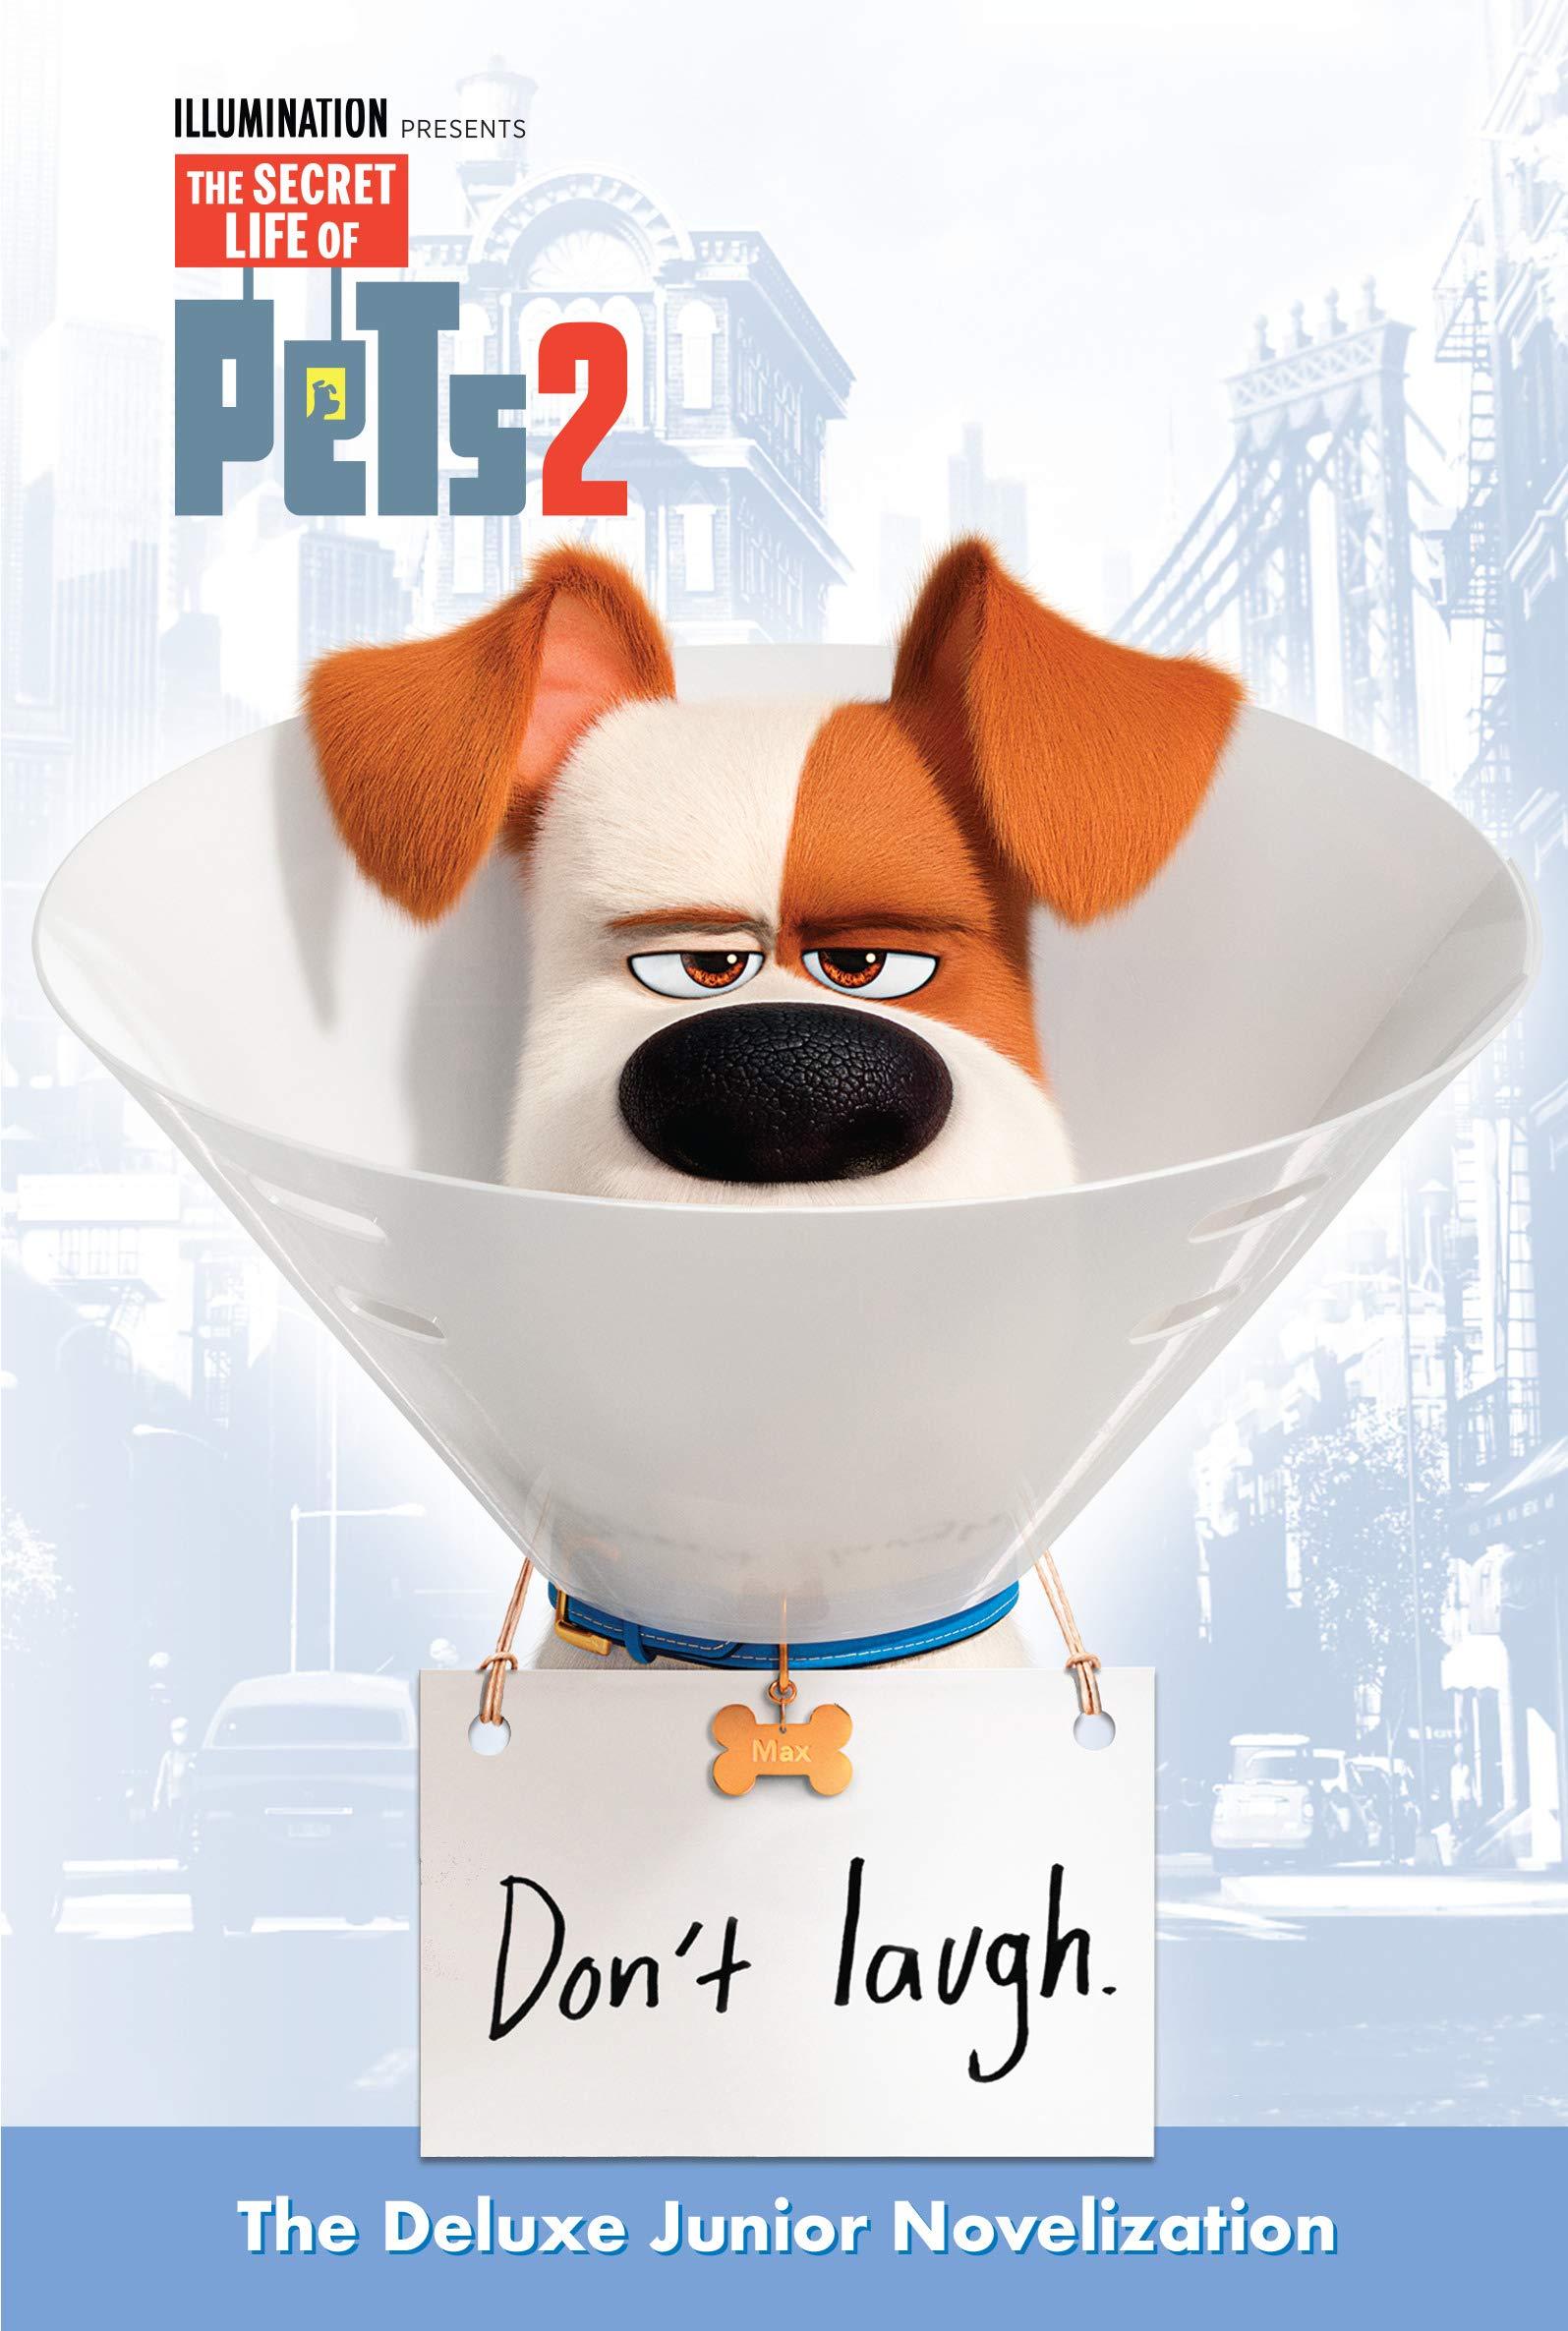 The Secret Life Of Pets 2 Deluxe Junior Novelization The Secret Life Of Pets 2 Lewman David 9781984849915 Amazon Com Books